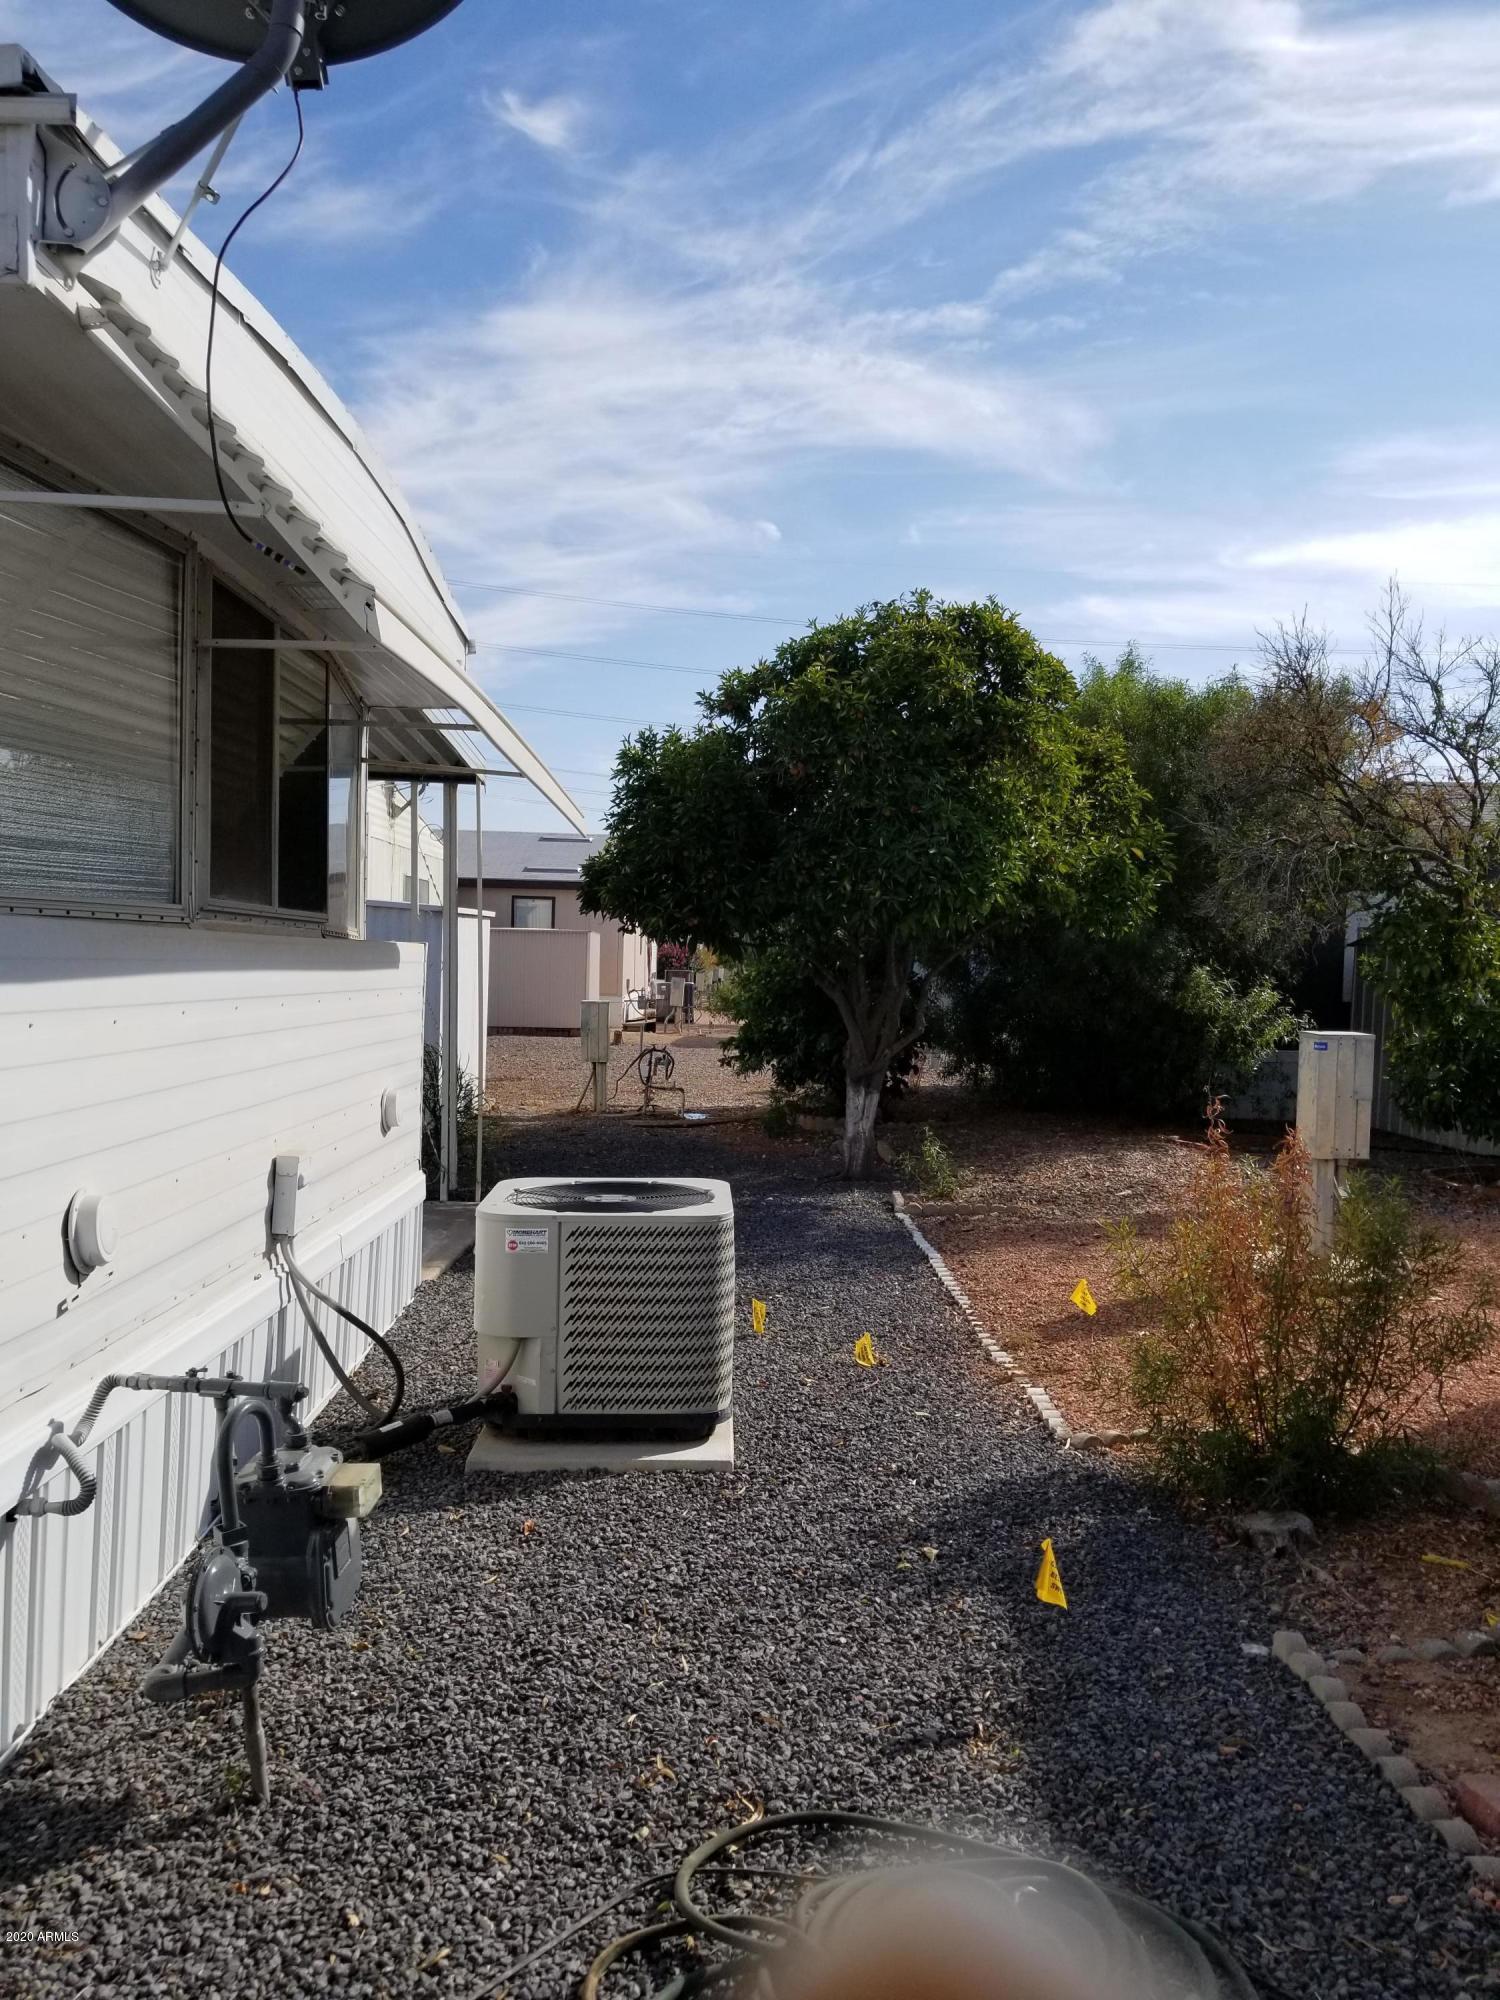 MLS 6144025 2650 W UNION HILLS Drive Unit 342, Phoenix, AZ 85027 Phoenix AZ Affordable